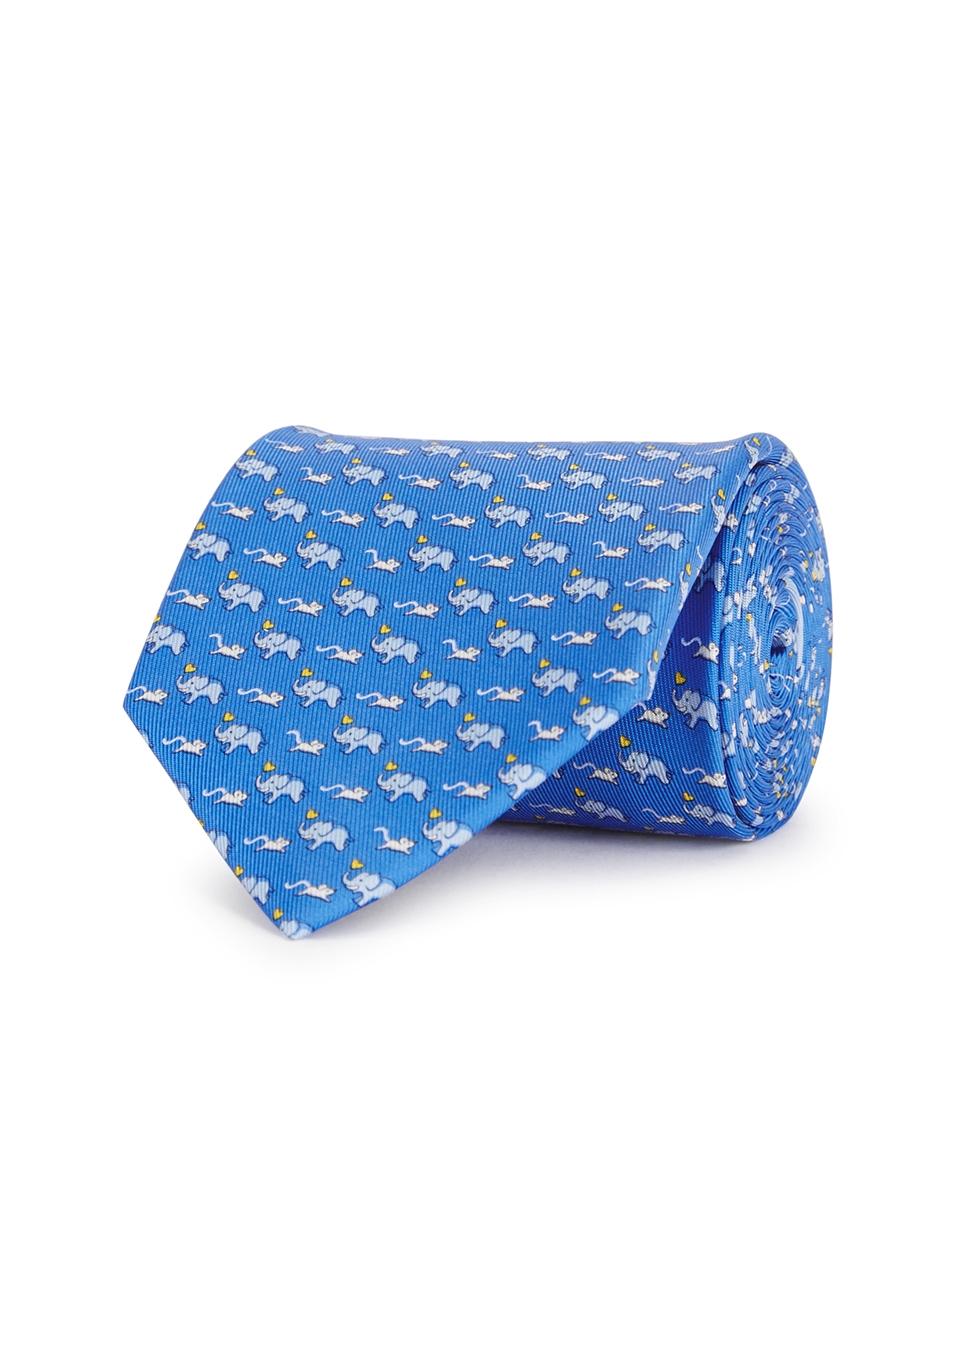 Blue elephant-print silk tie - Salvatore Ferragamo